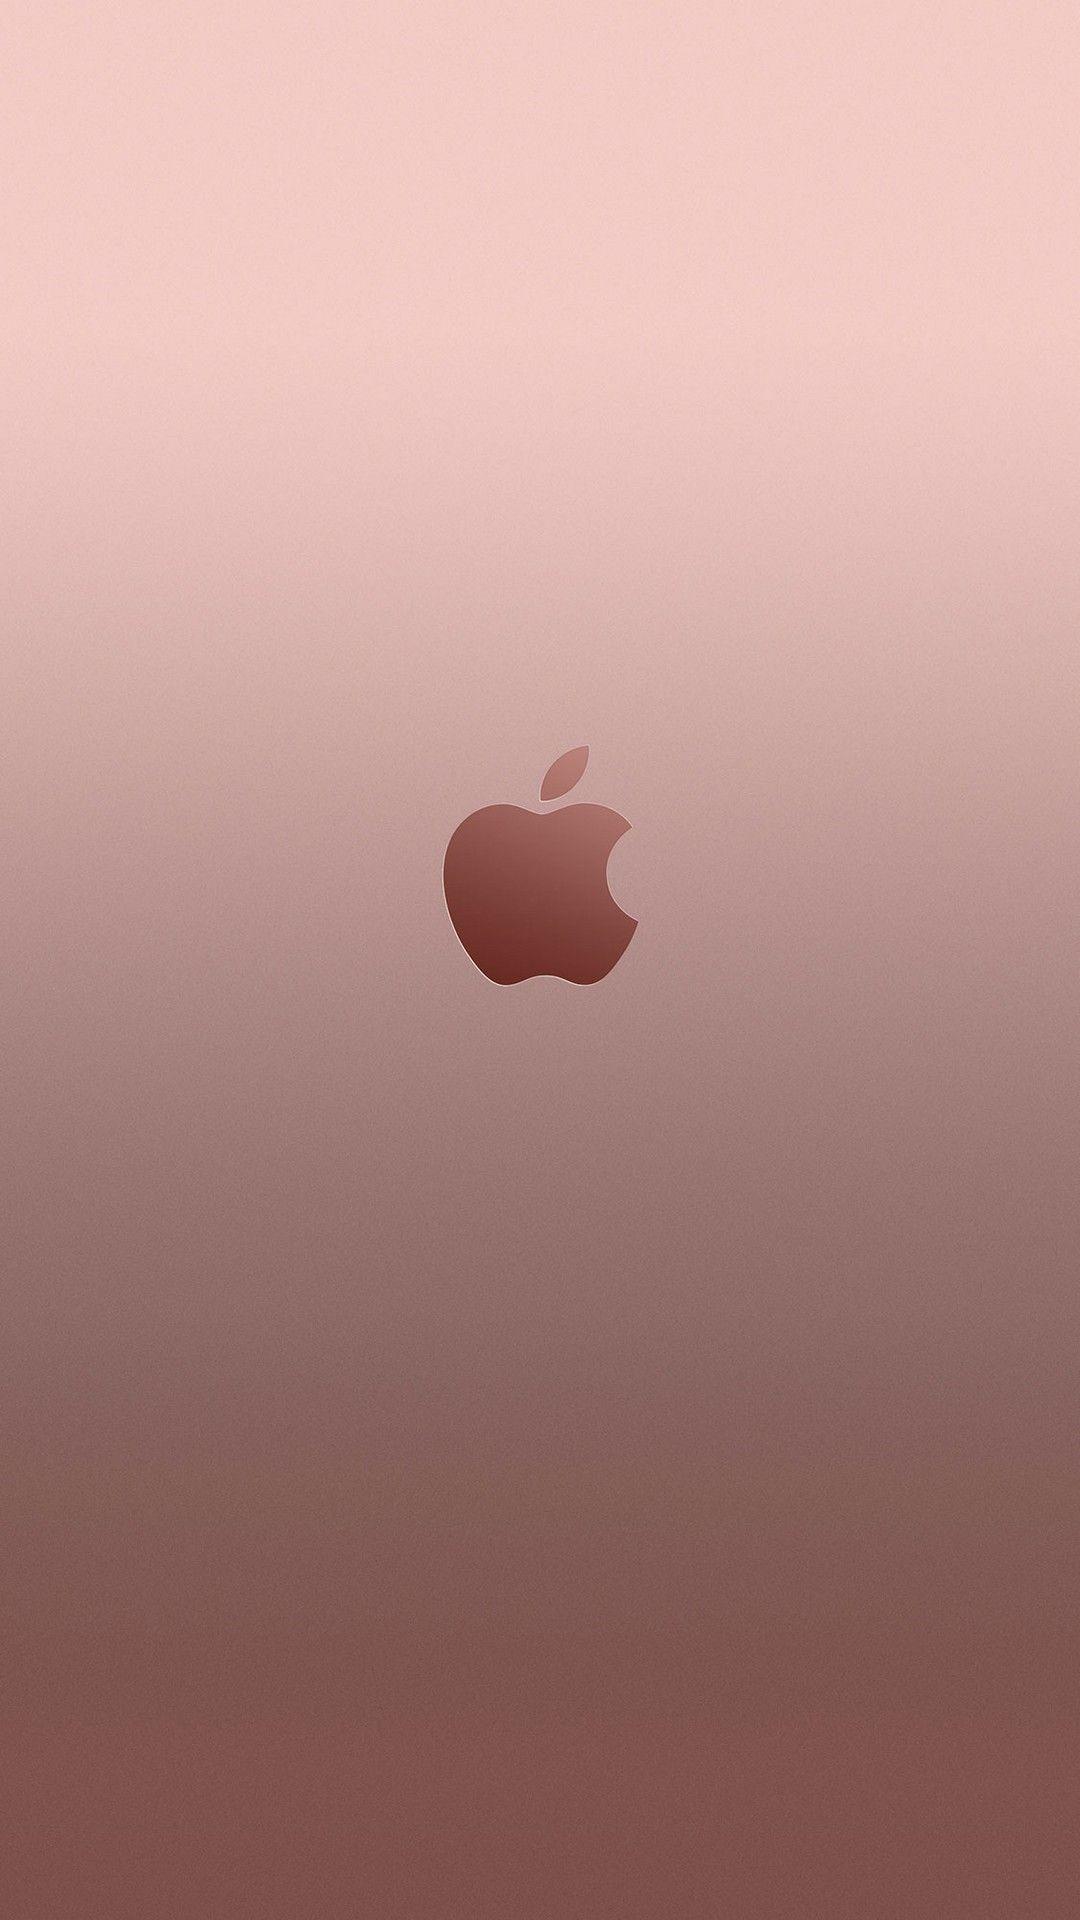 1080x1920 6 Plus Rose Gold Apple Apple Wallpaper Iphone Apple Wallpaper Apple Logo Wallpaper Iphone